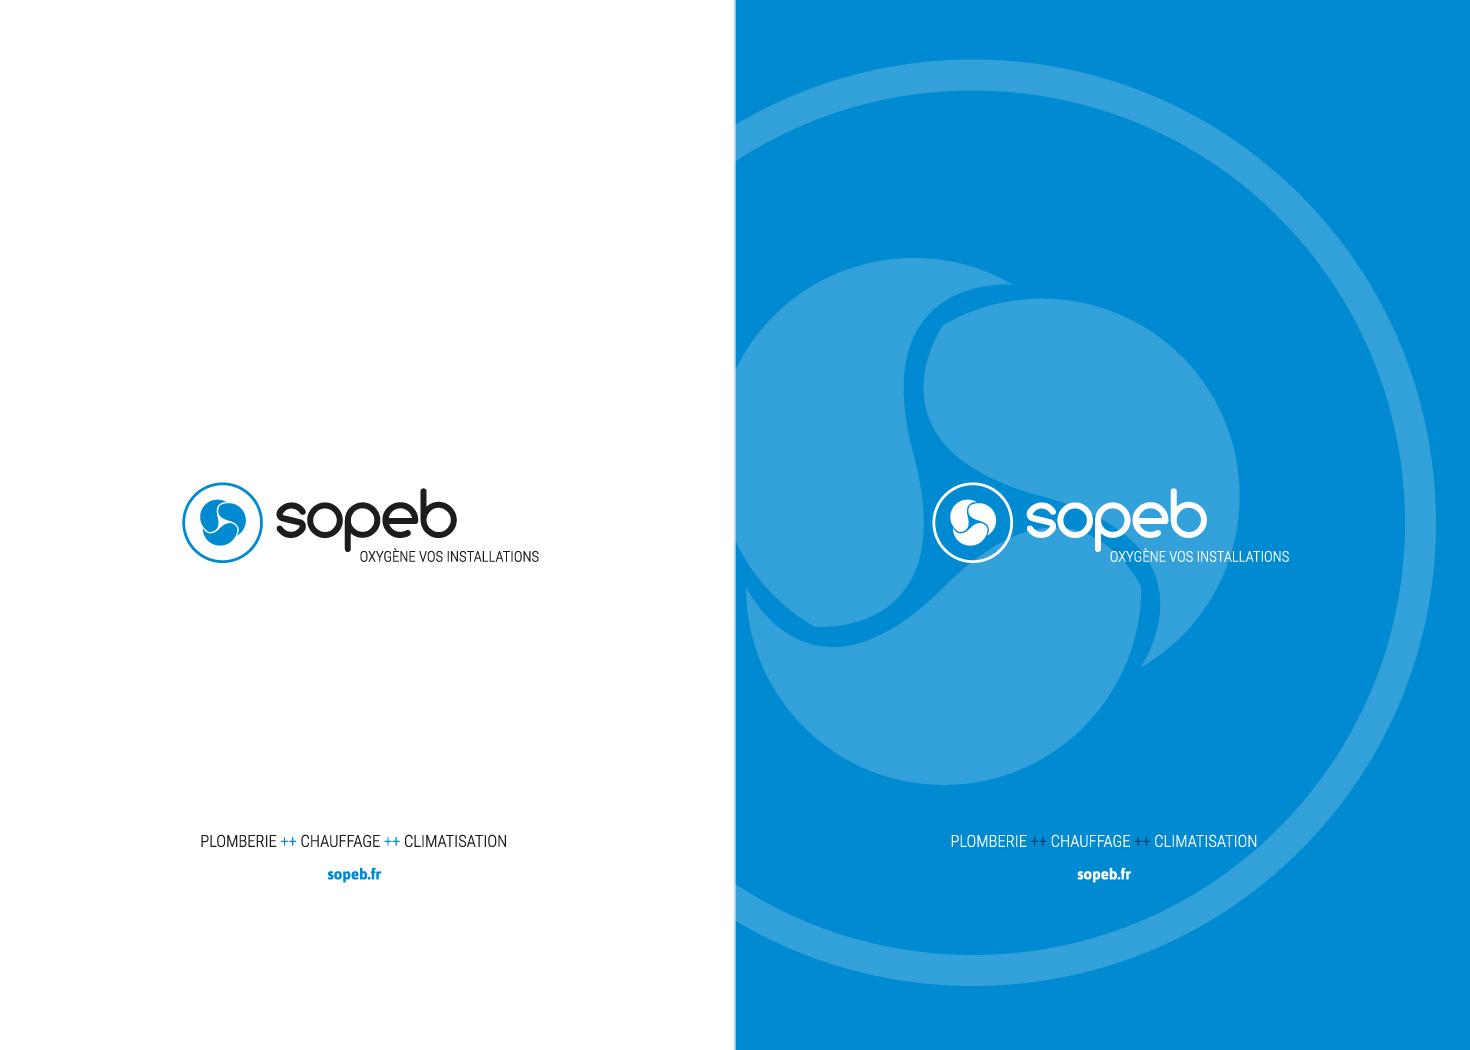 sopeb-com1